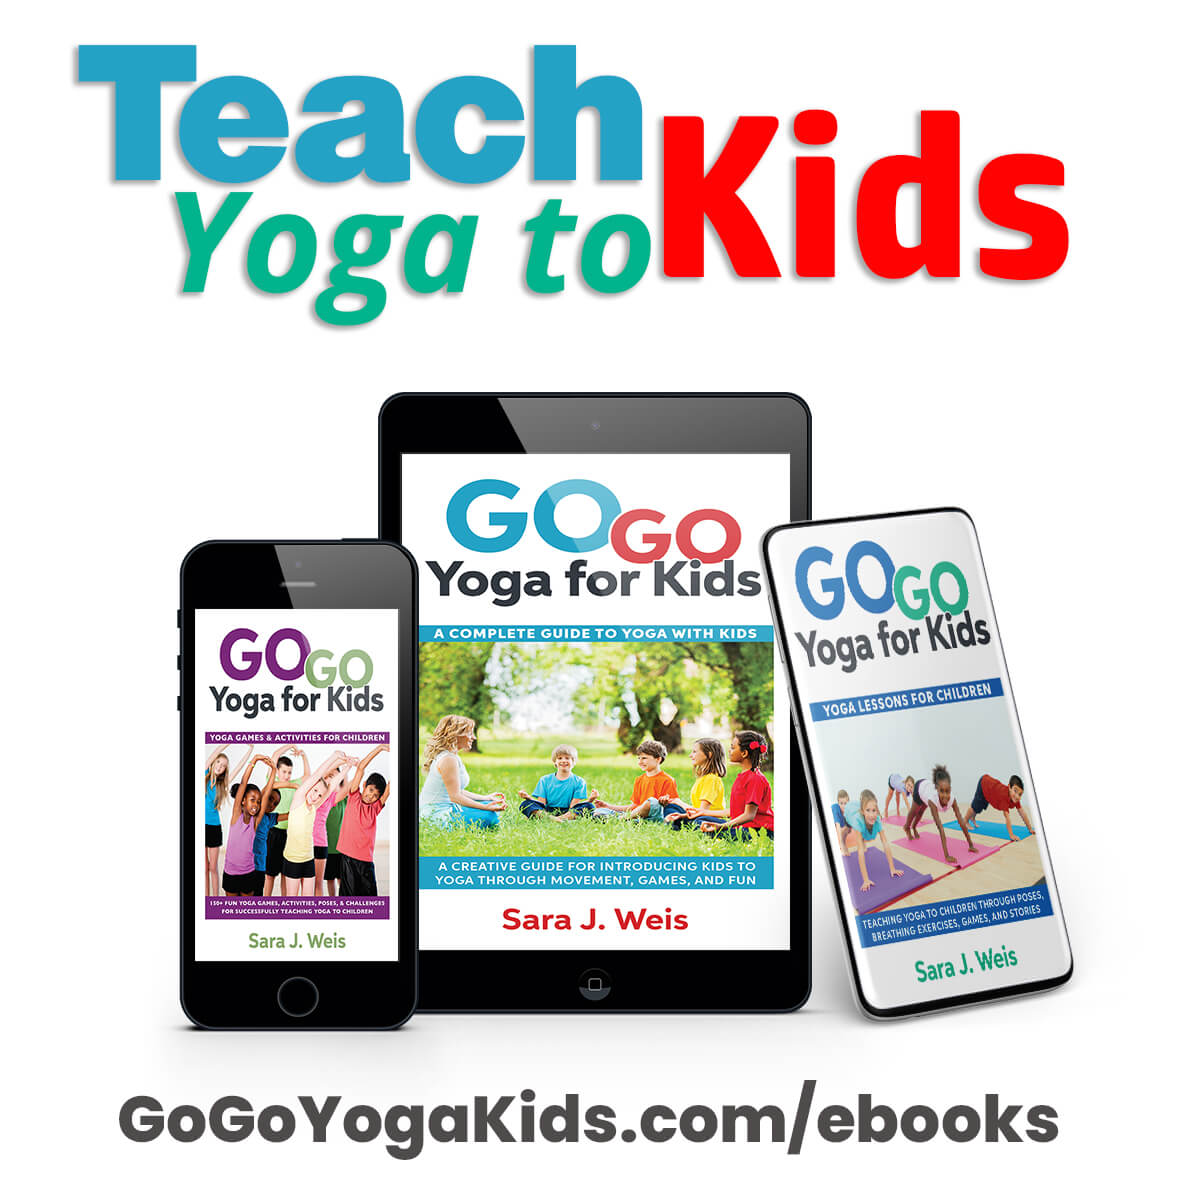 go go yoga for kids books